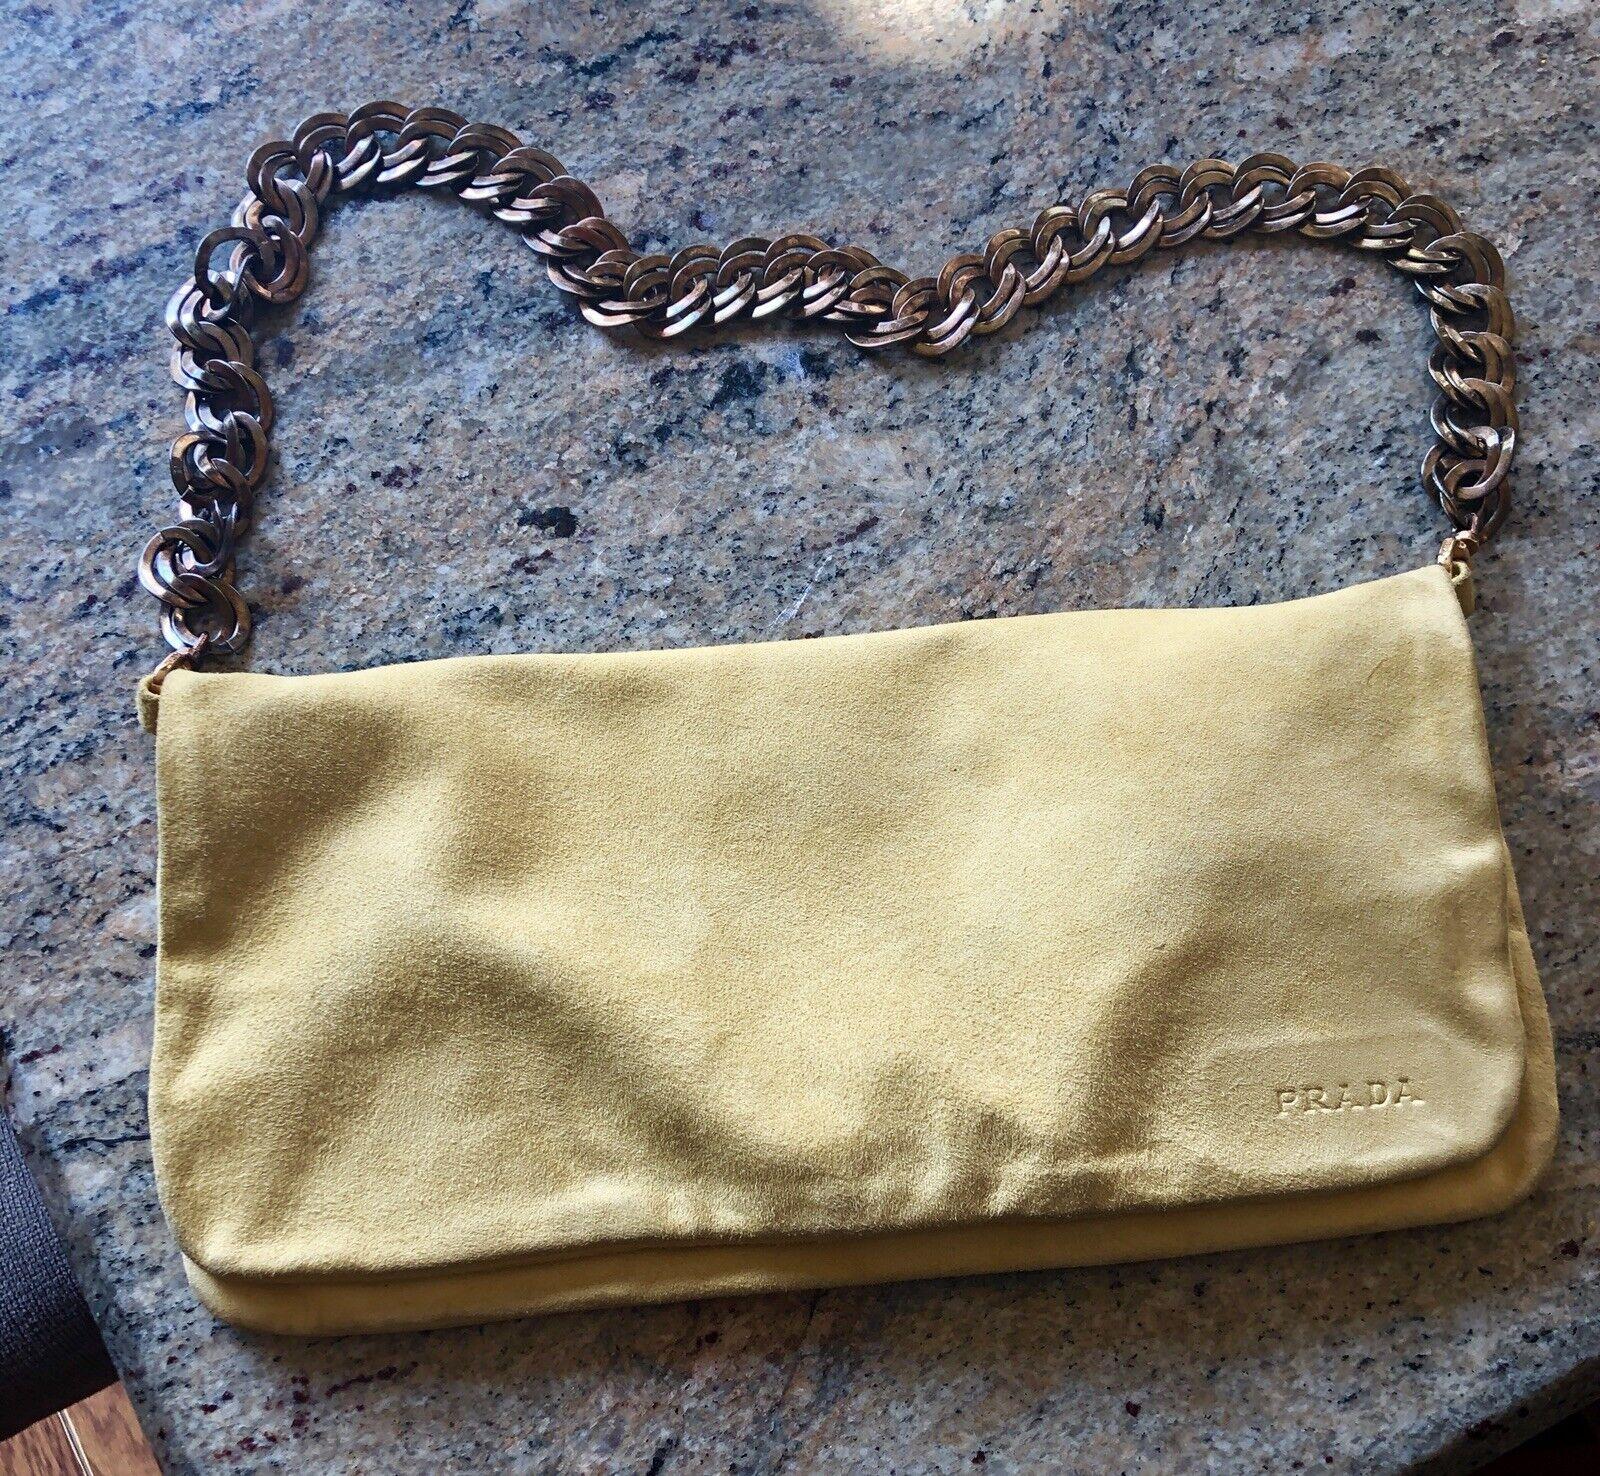 PRADA Handbag Yellow Soft Suede Envelope Chain Bag or Clutch